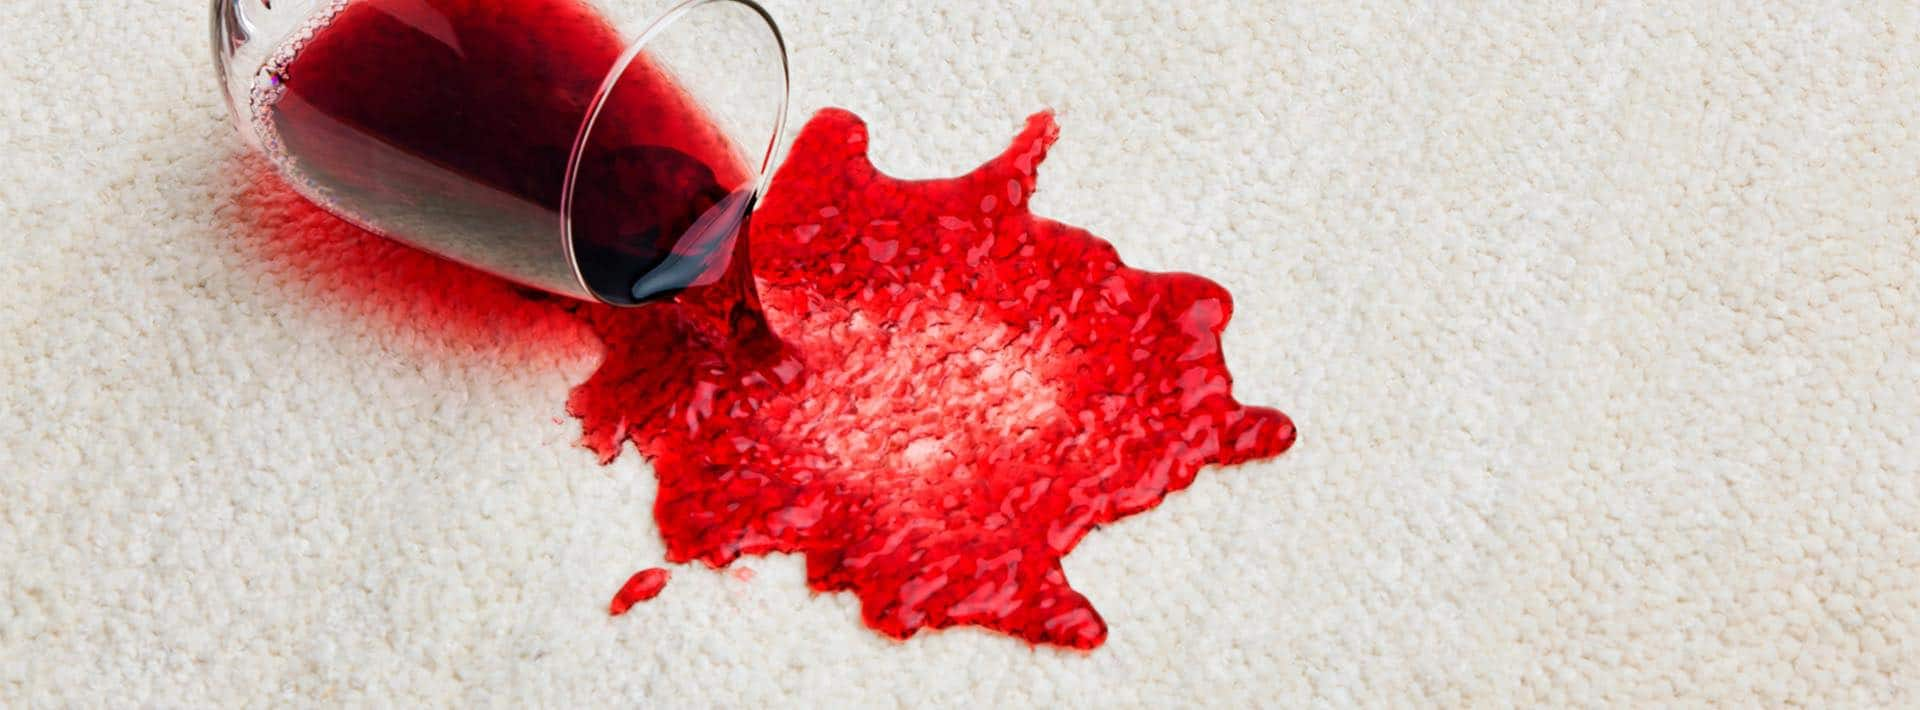 Elimina manchas de alfombras